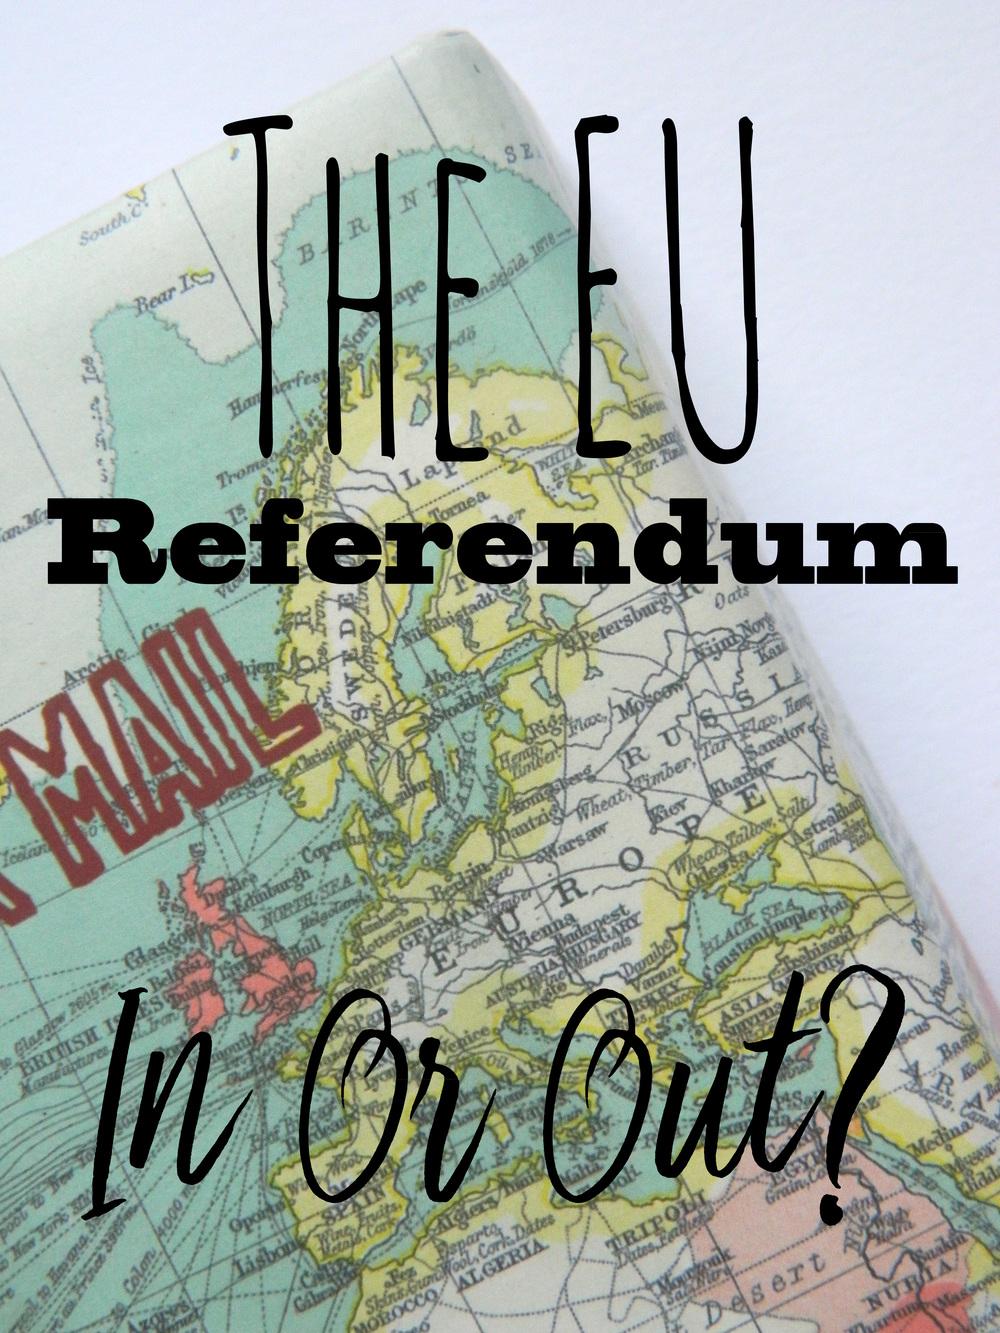 Visit the EU Referendum website here .